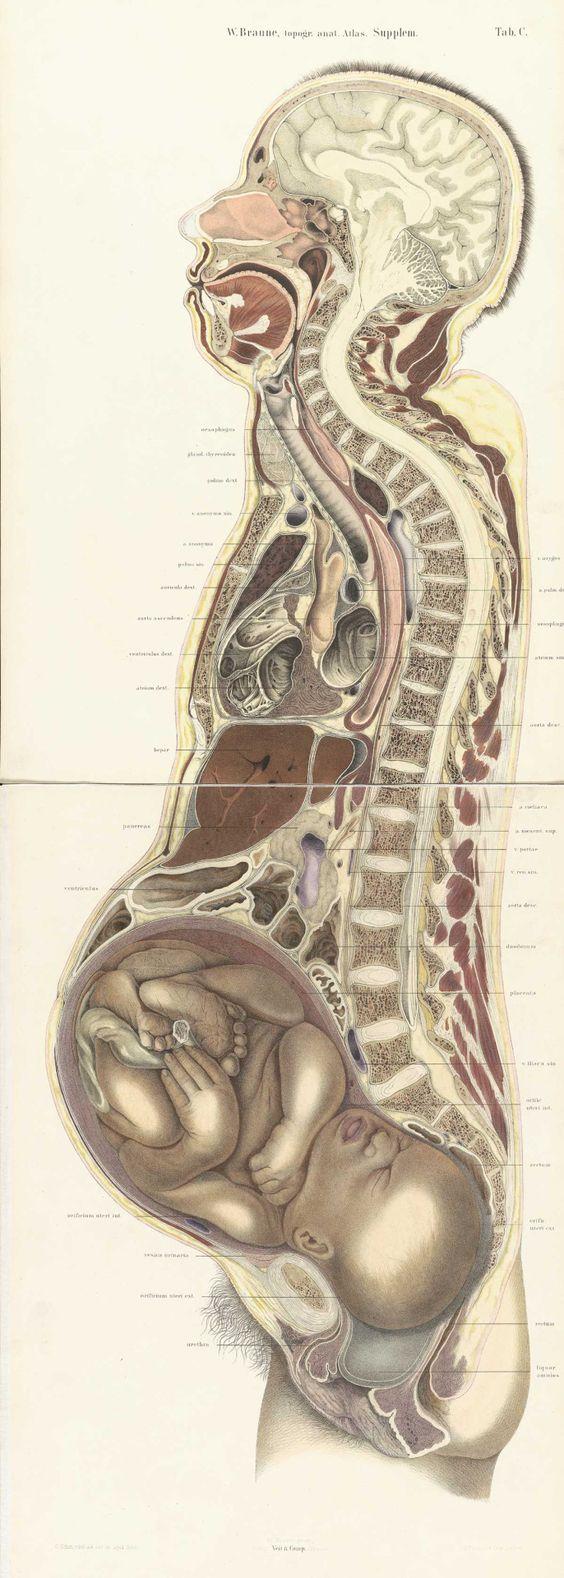 Pregnant female body cross section by Wilhelm Braune